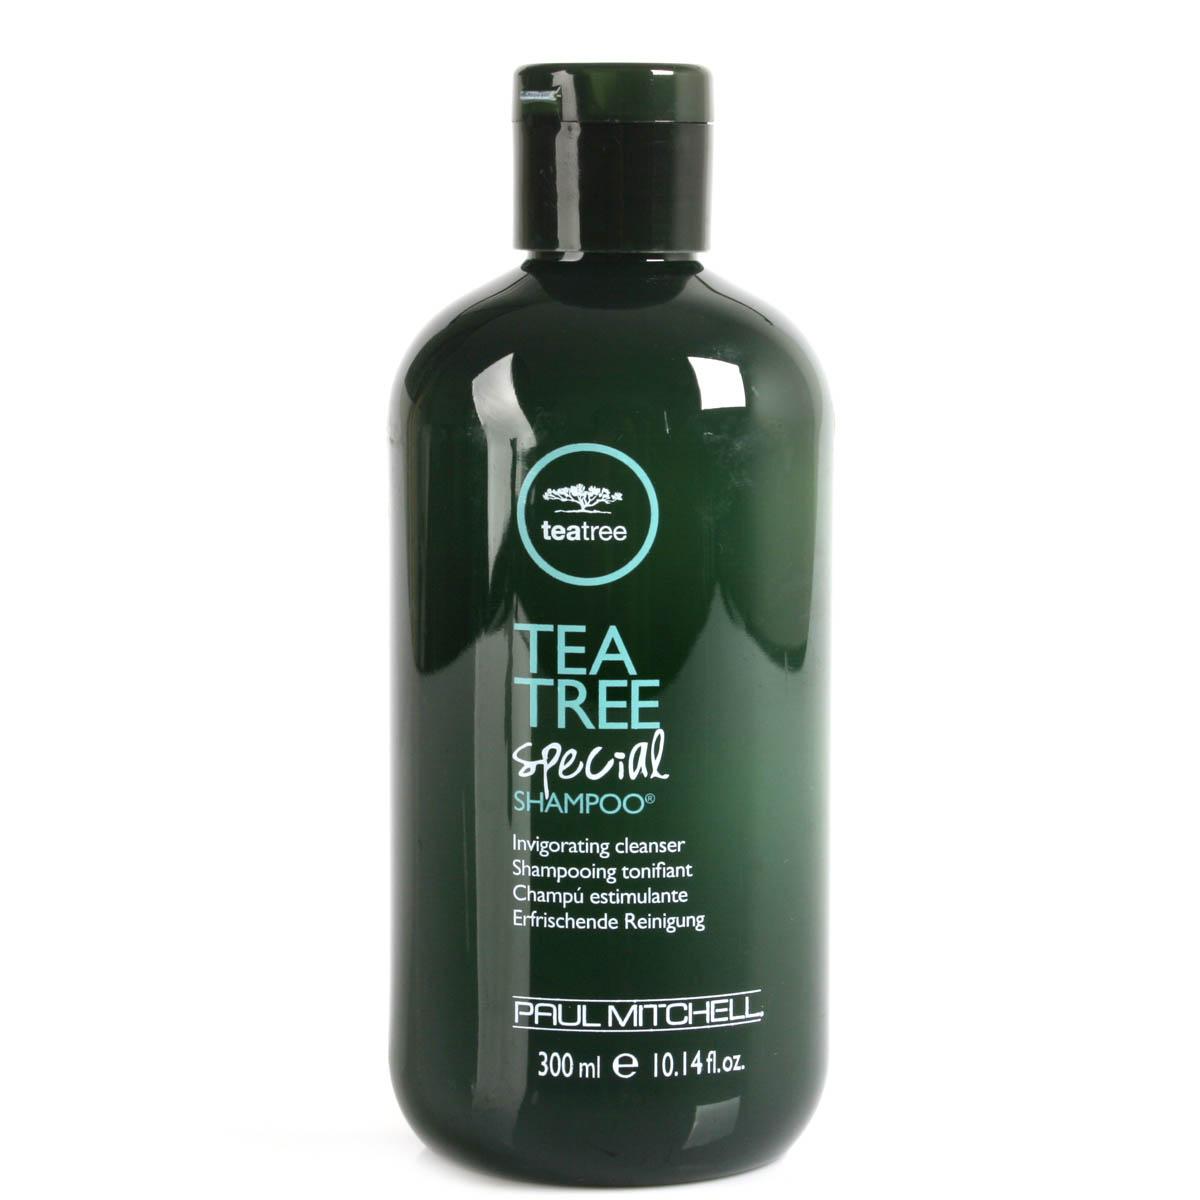 Paul_Mitchell_Tea_Tree_Special_Shampoo.jpg